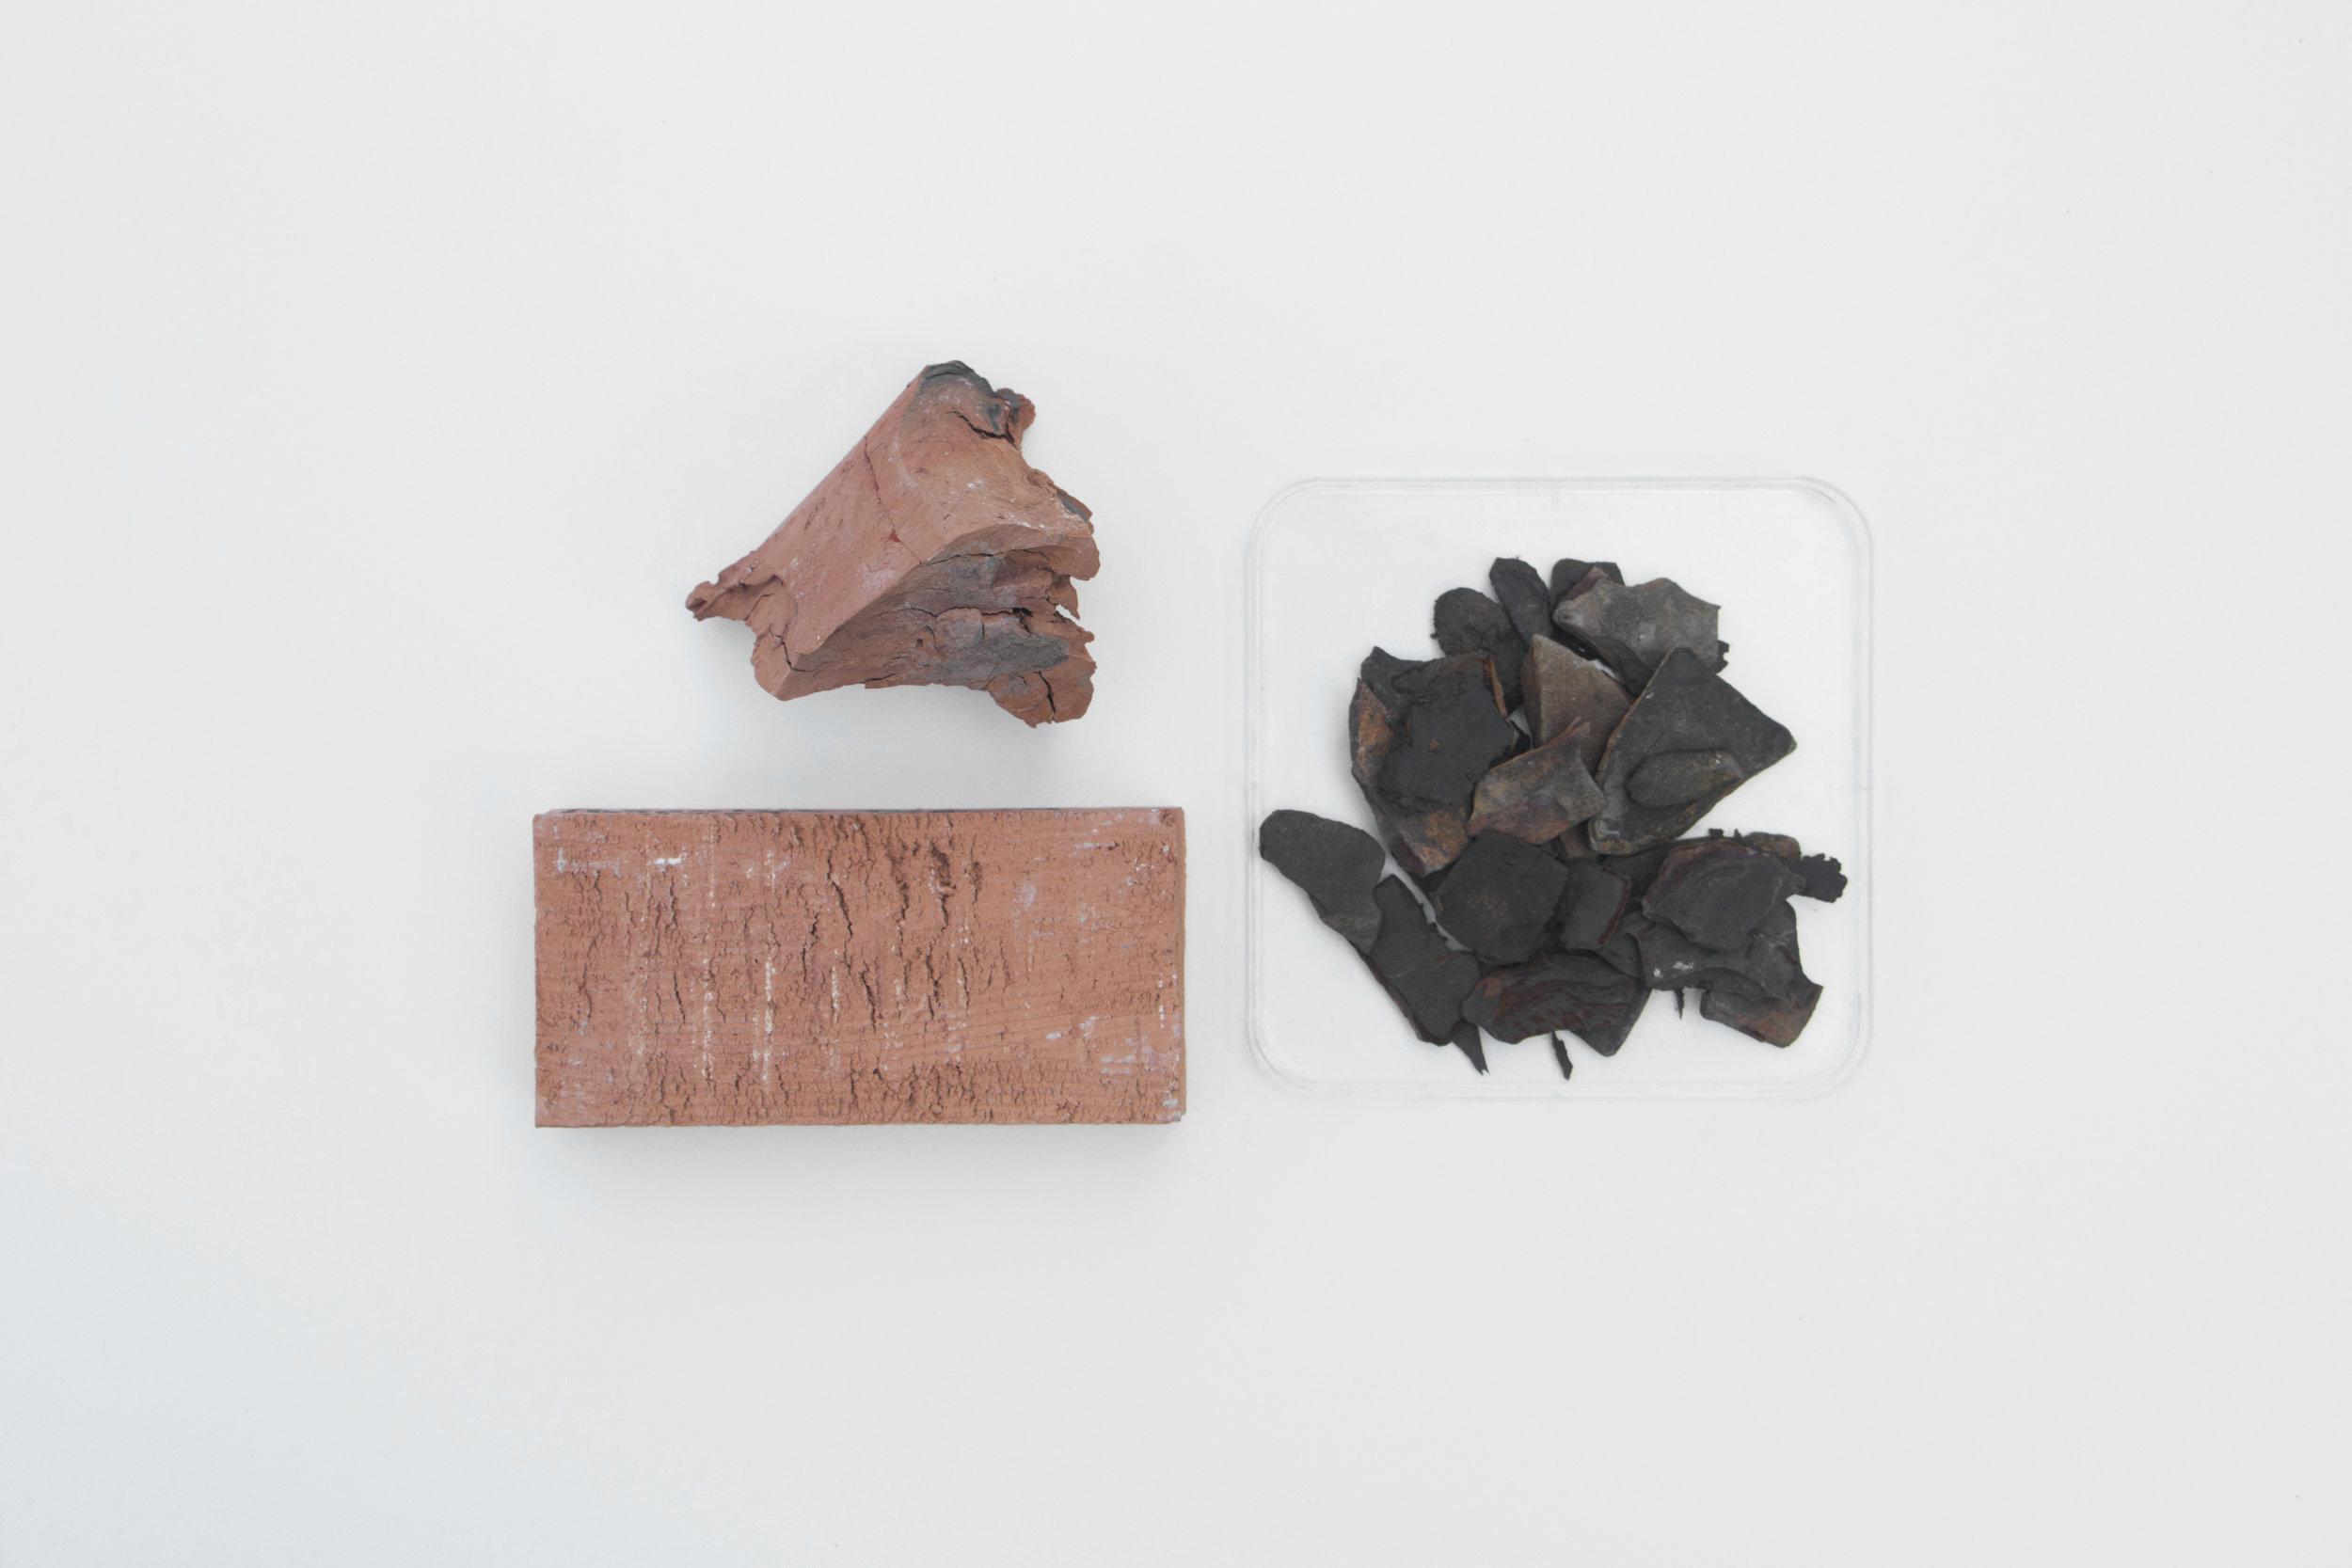 carly_ceramics_materials_6.jpg